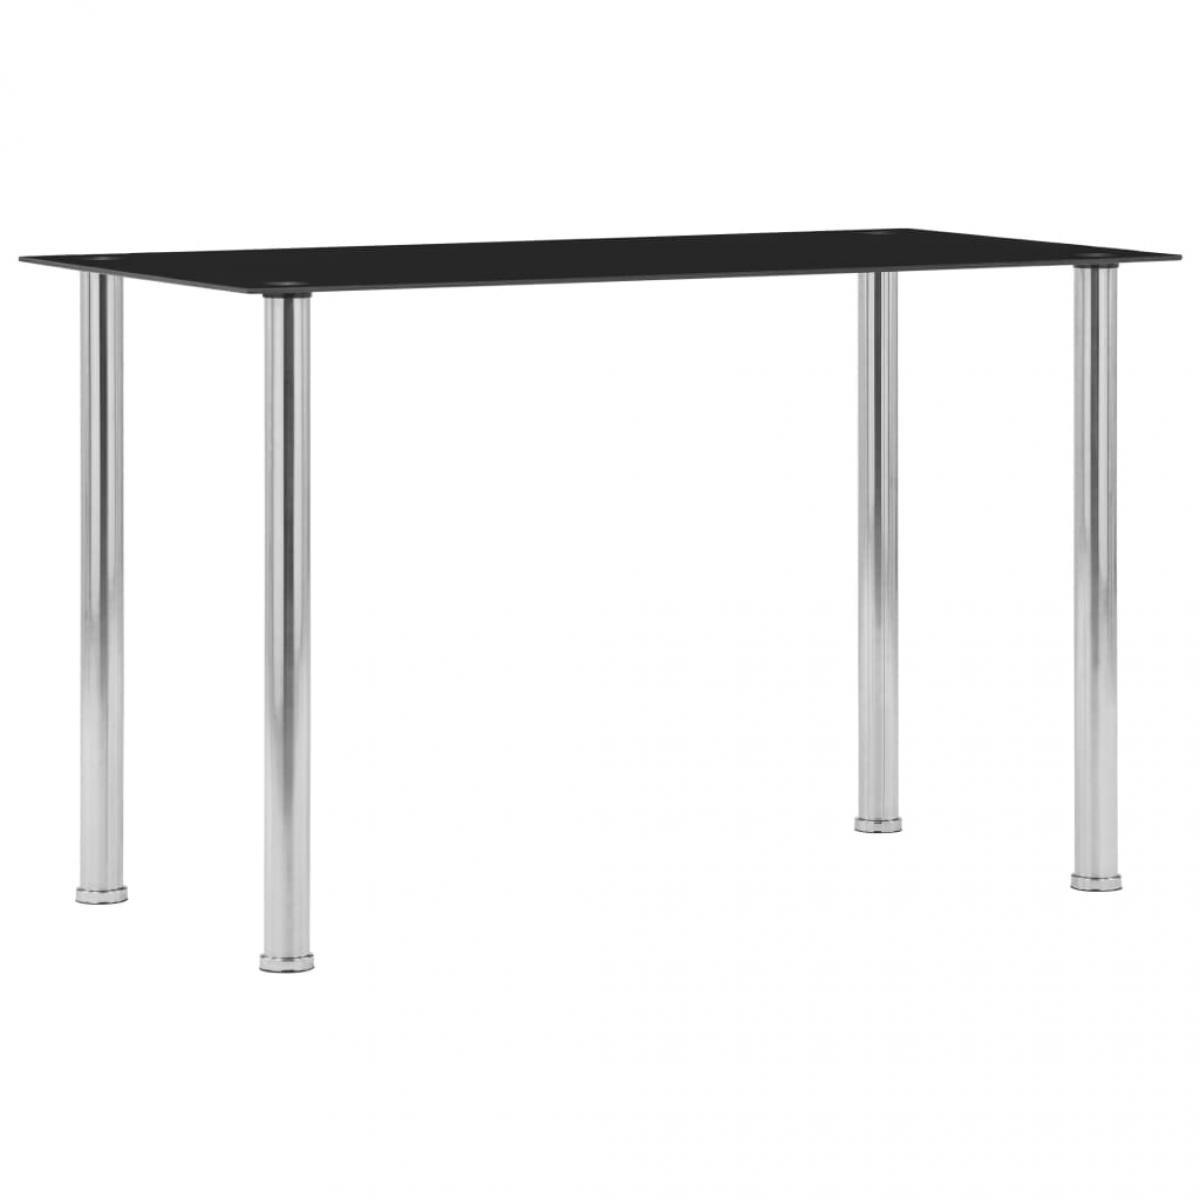 Vidaxl vidaXL Table à dîner Noir 120x60x75 cm Verre trempé